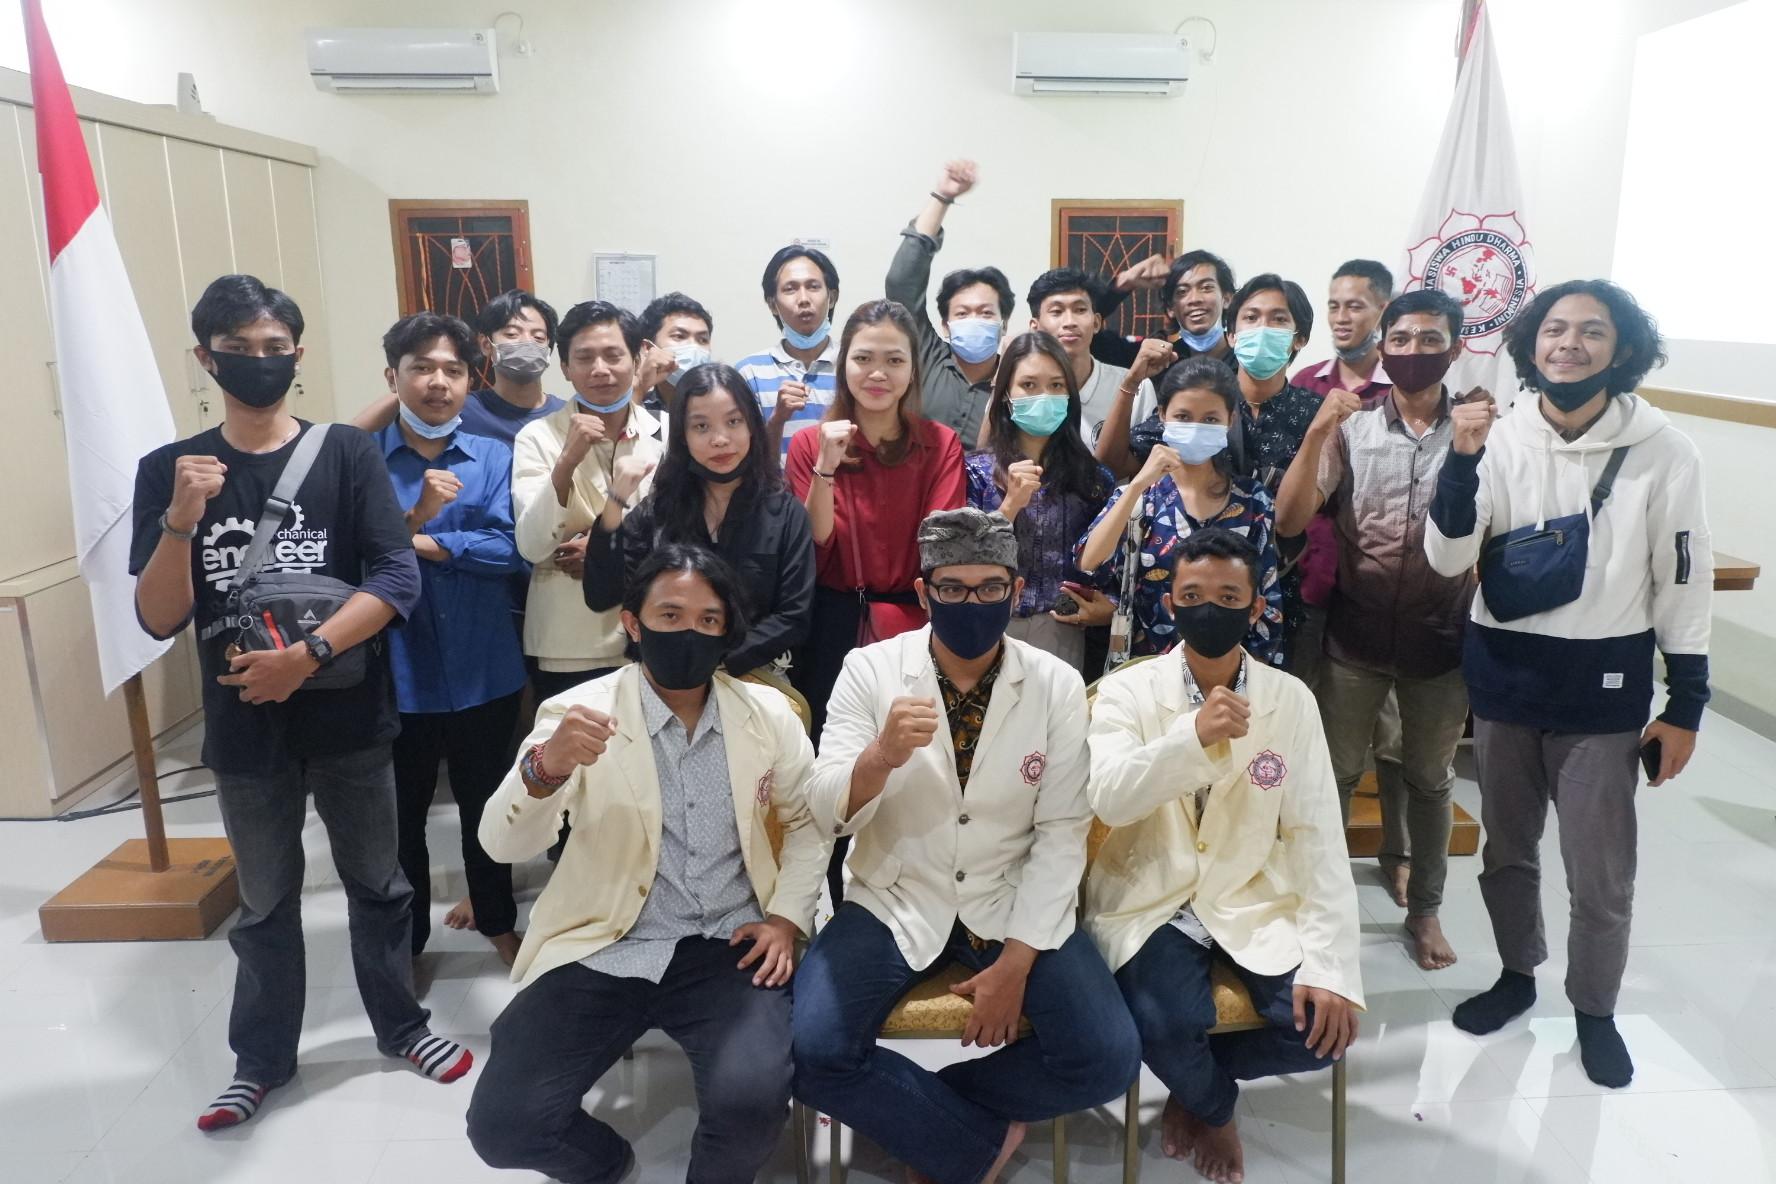 Evaluasi Program Kerja dan Aktualisasi Semangat Ber-KMHDI di Era New Normal PC KMHDI Makassar Gelar RAKORCAB I